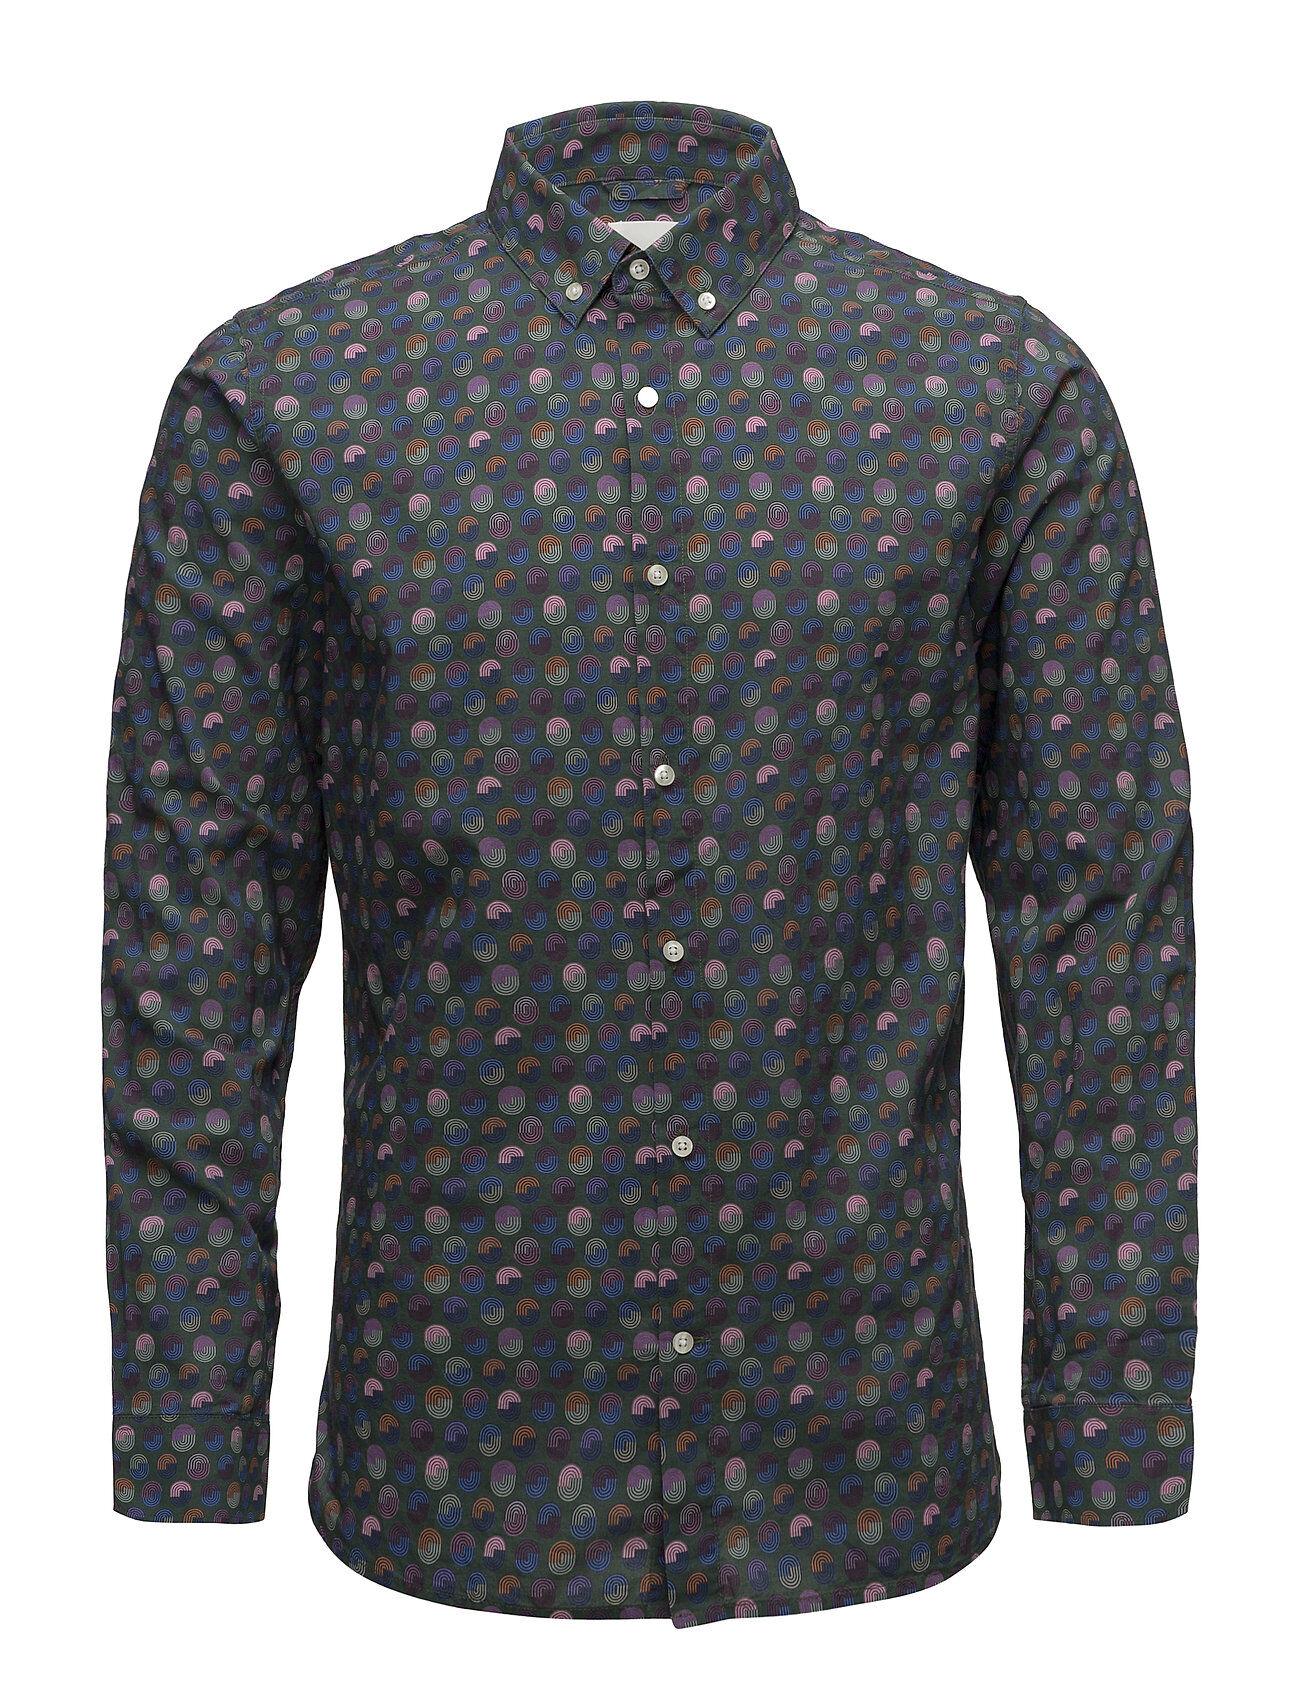 Knowledge Cotton Apparel Art Printed Shirt - Gots